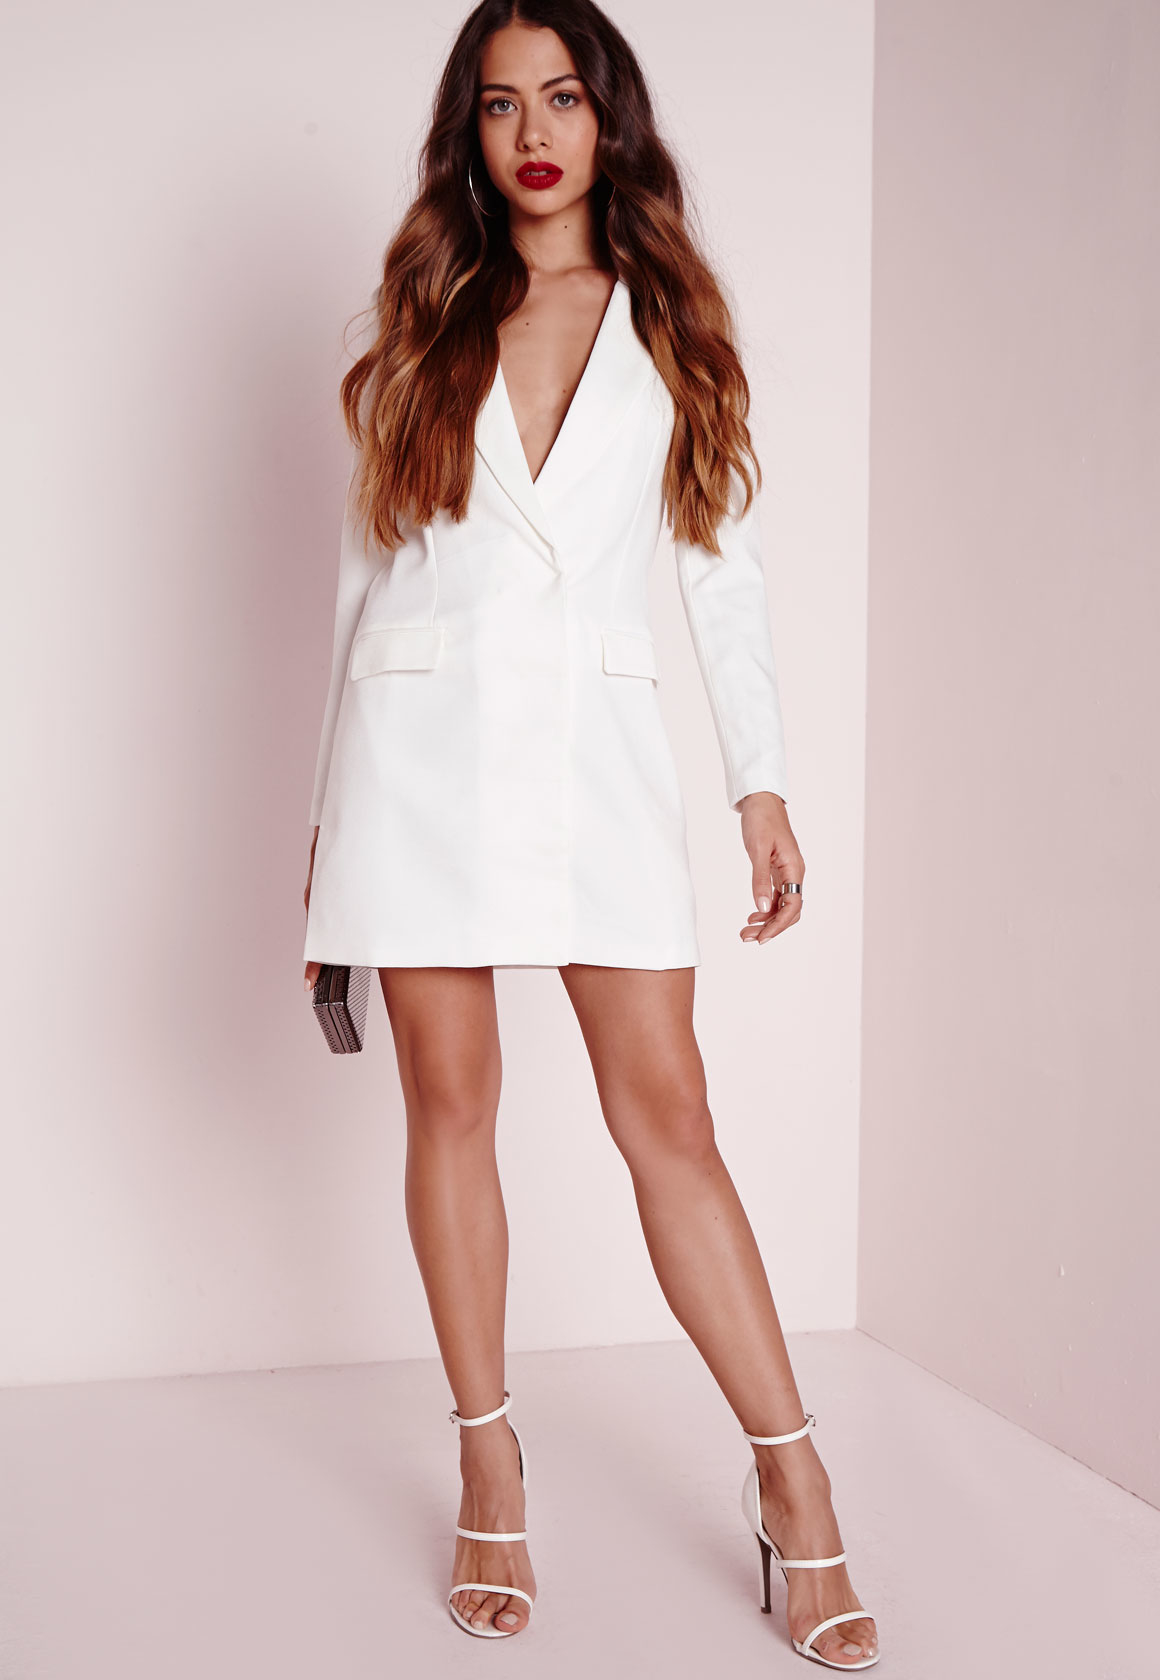 Lyst Missguided Long Sleeve Blazer Dress White In White